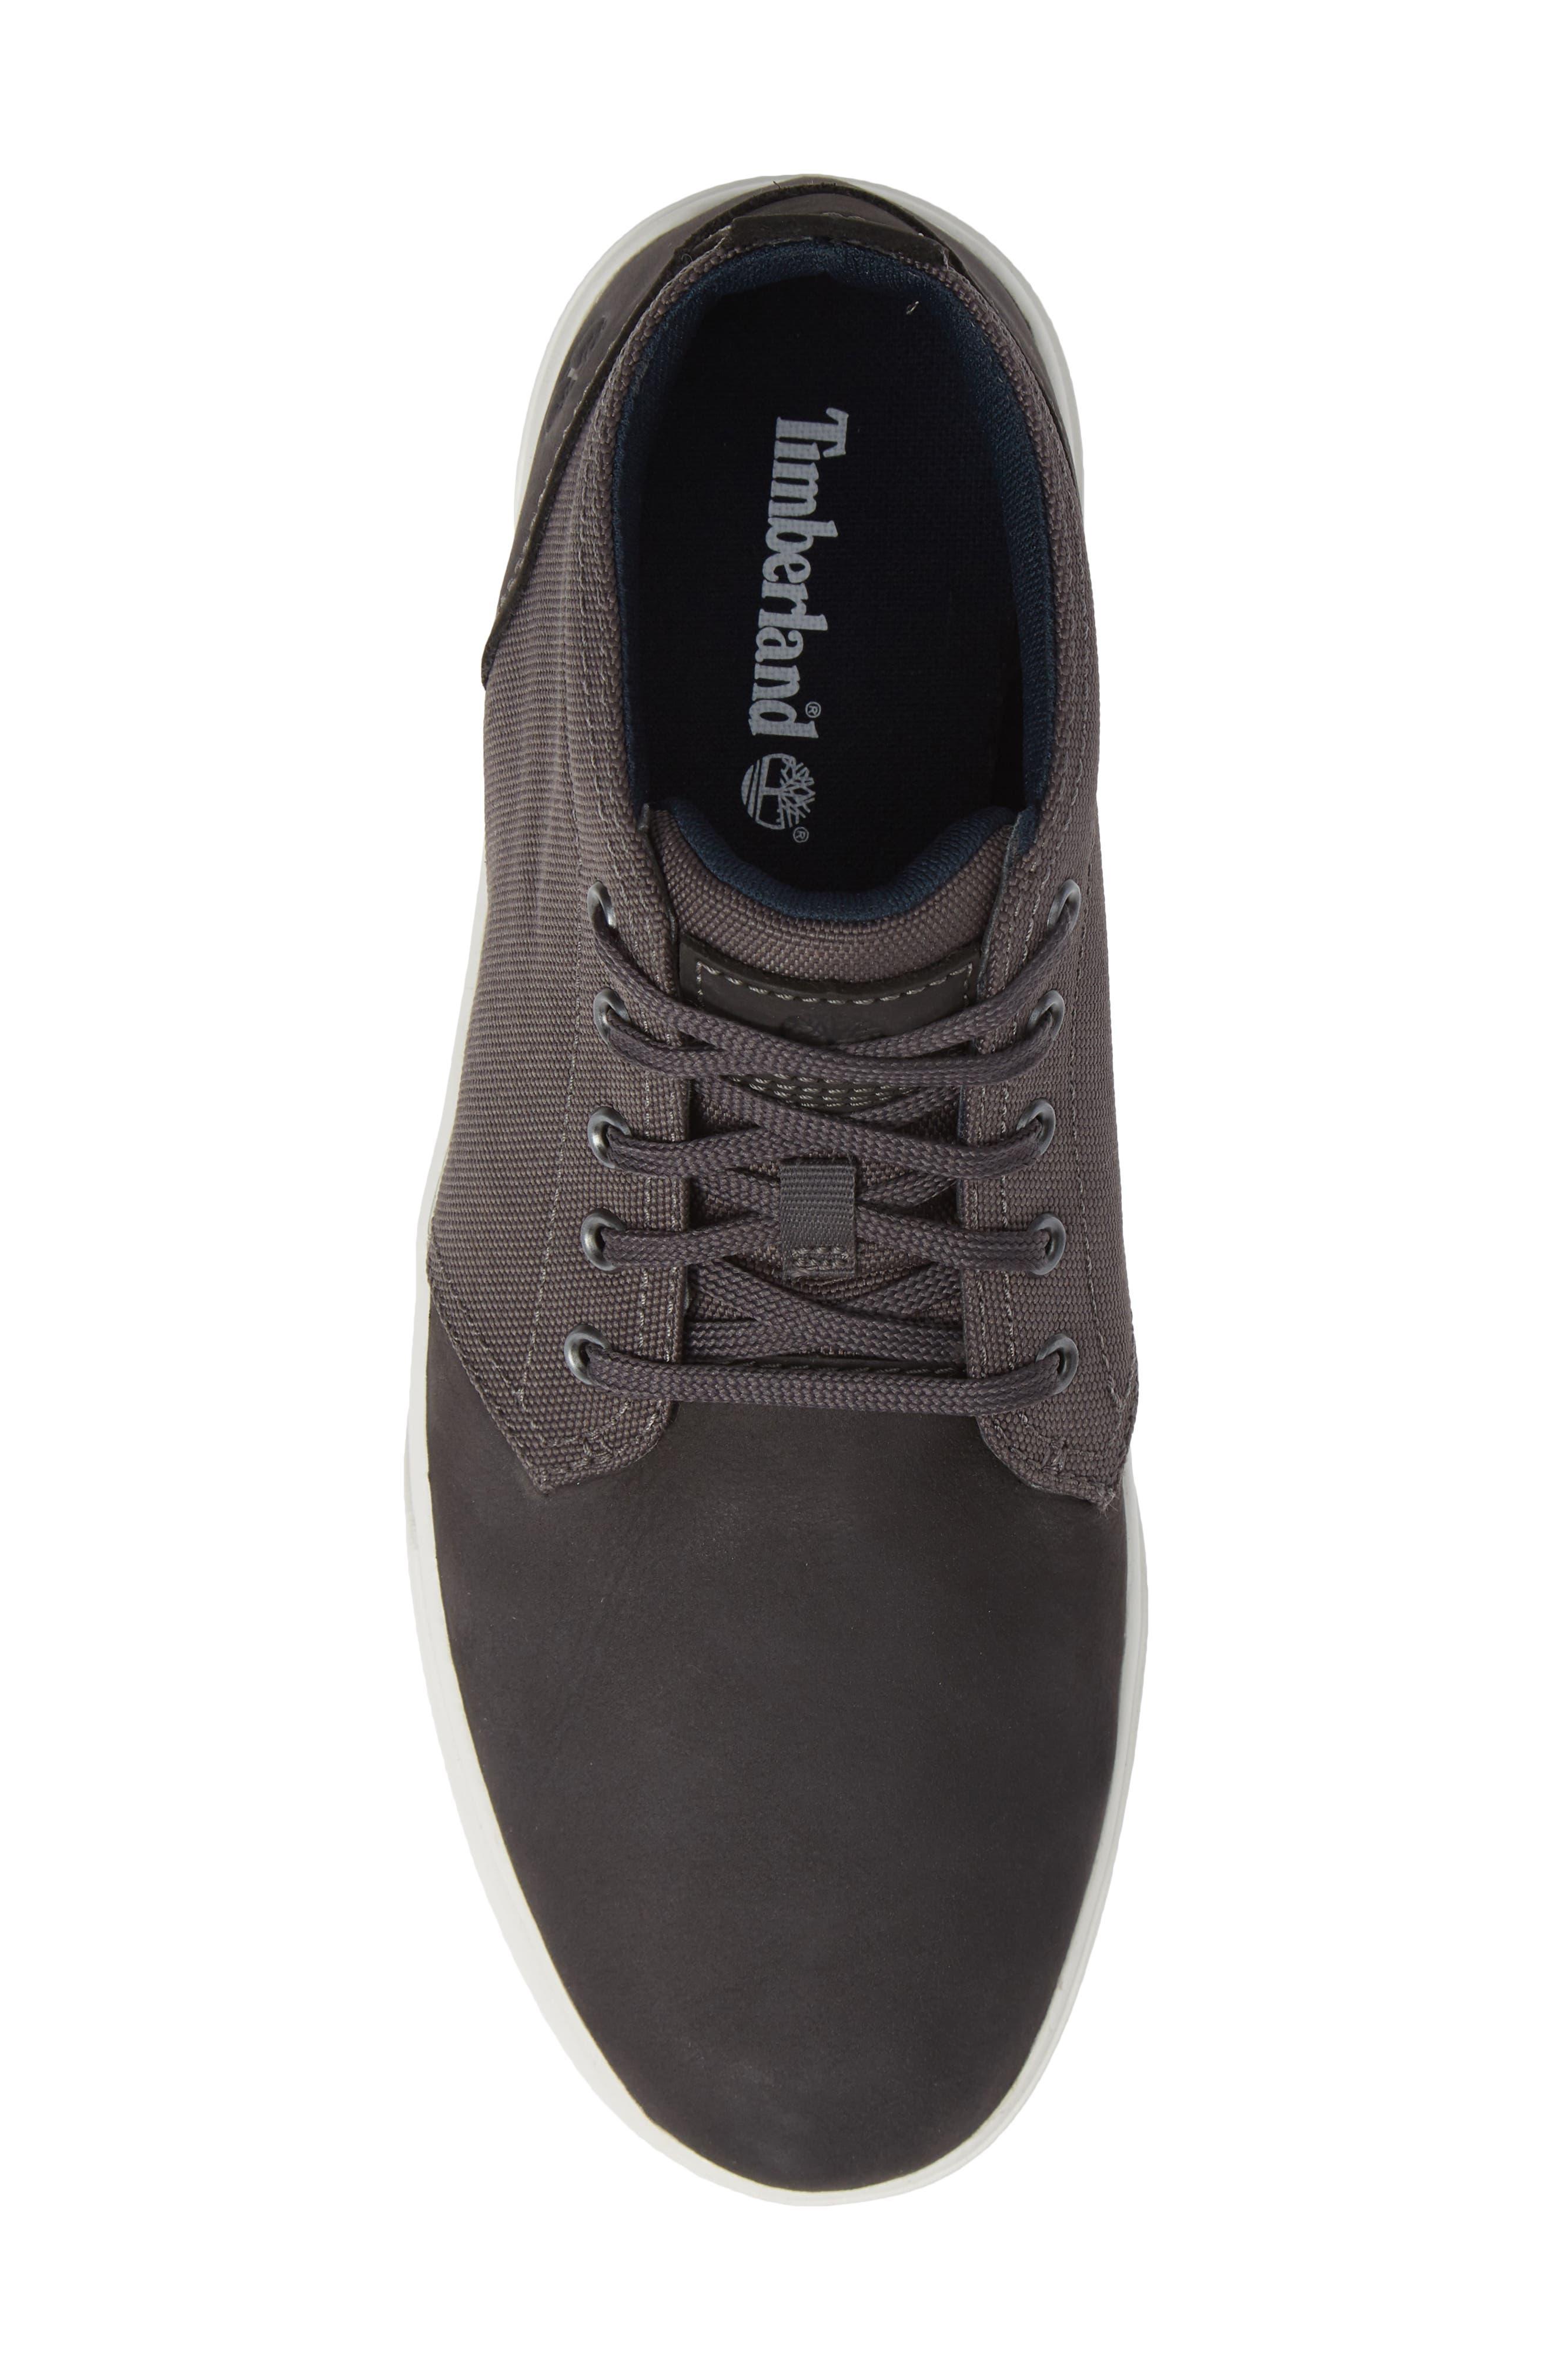 Earthkeepers<sup>®</sup> 'Groveton' Chukka Sneaker,                             Alternate thumbnail 5, color,                             CHARCOAL